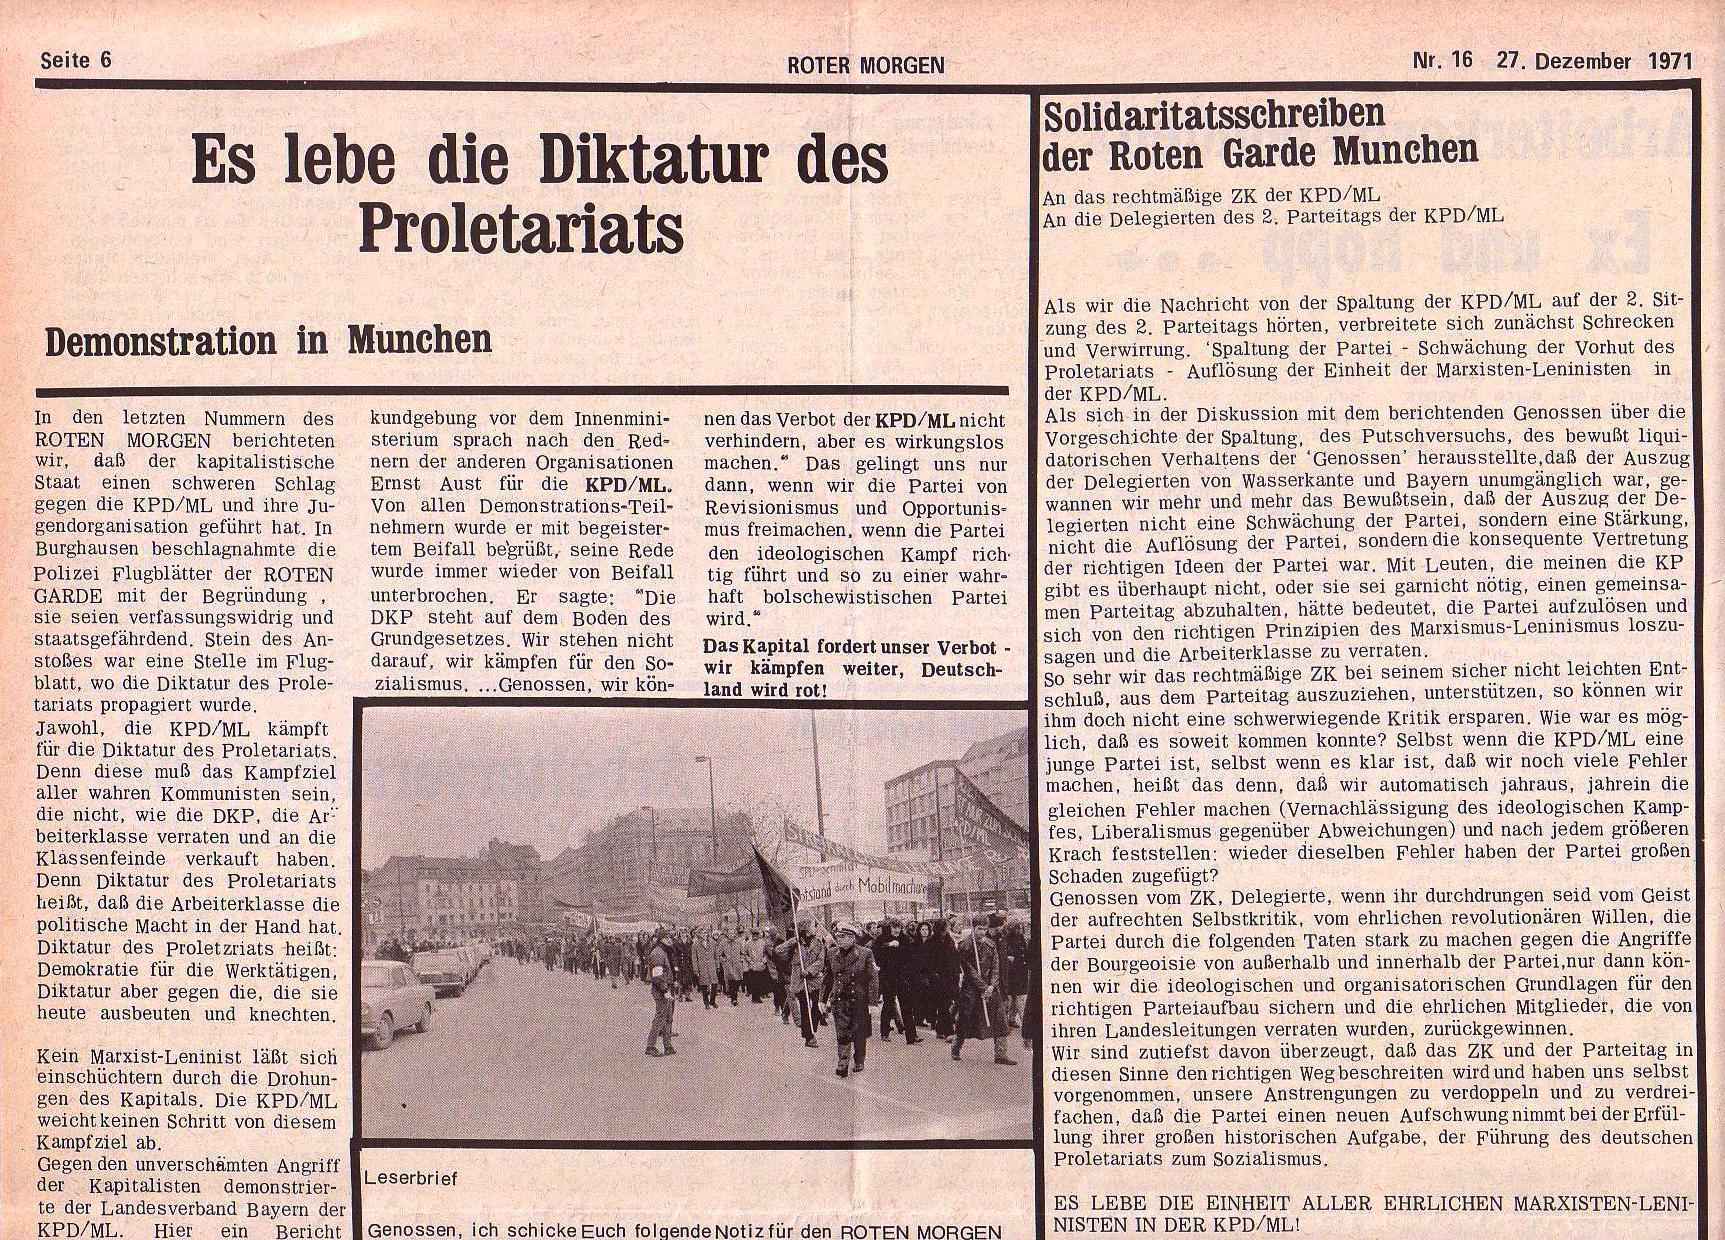 Roter Morgen, 5. Jg., 27. Dezember 1971, Nr. 16, Seite 6a